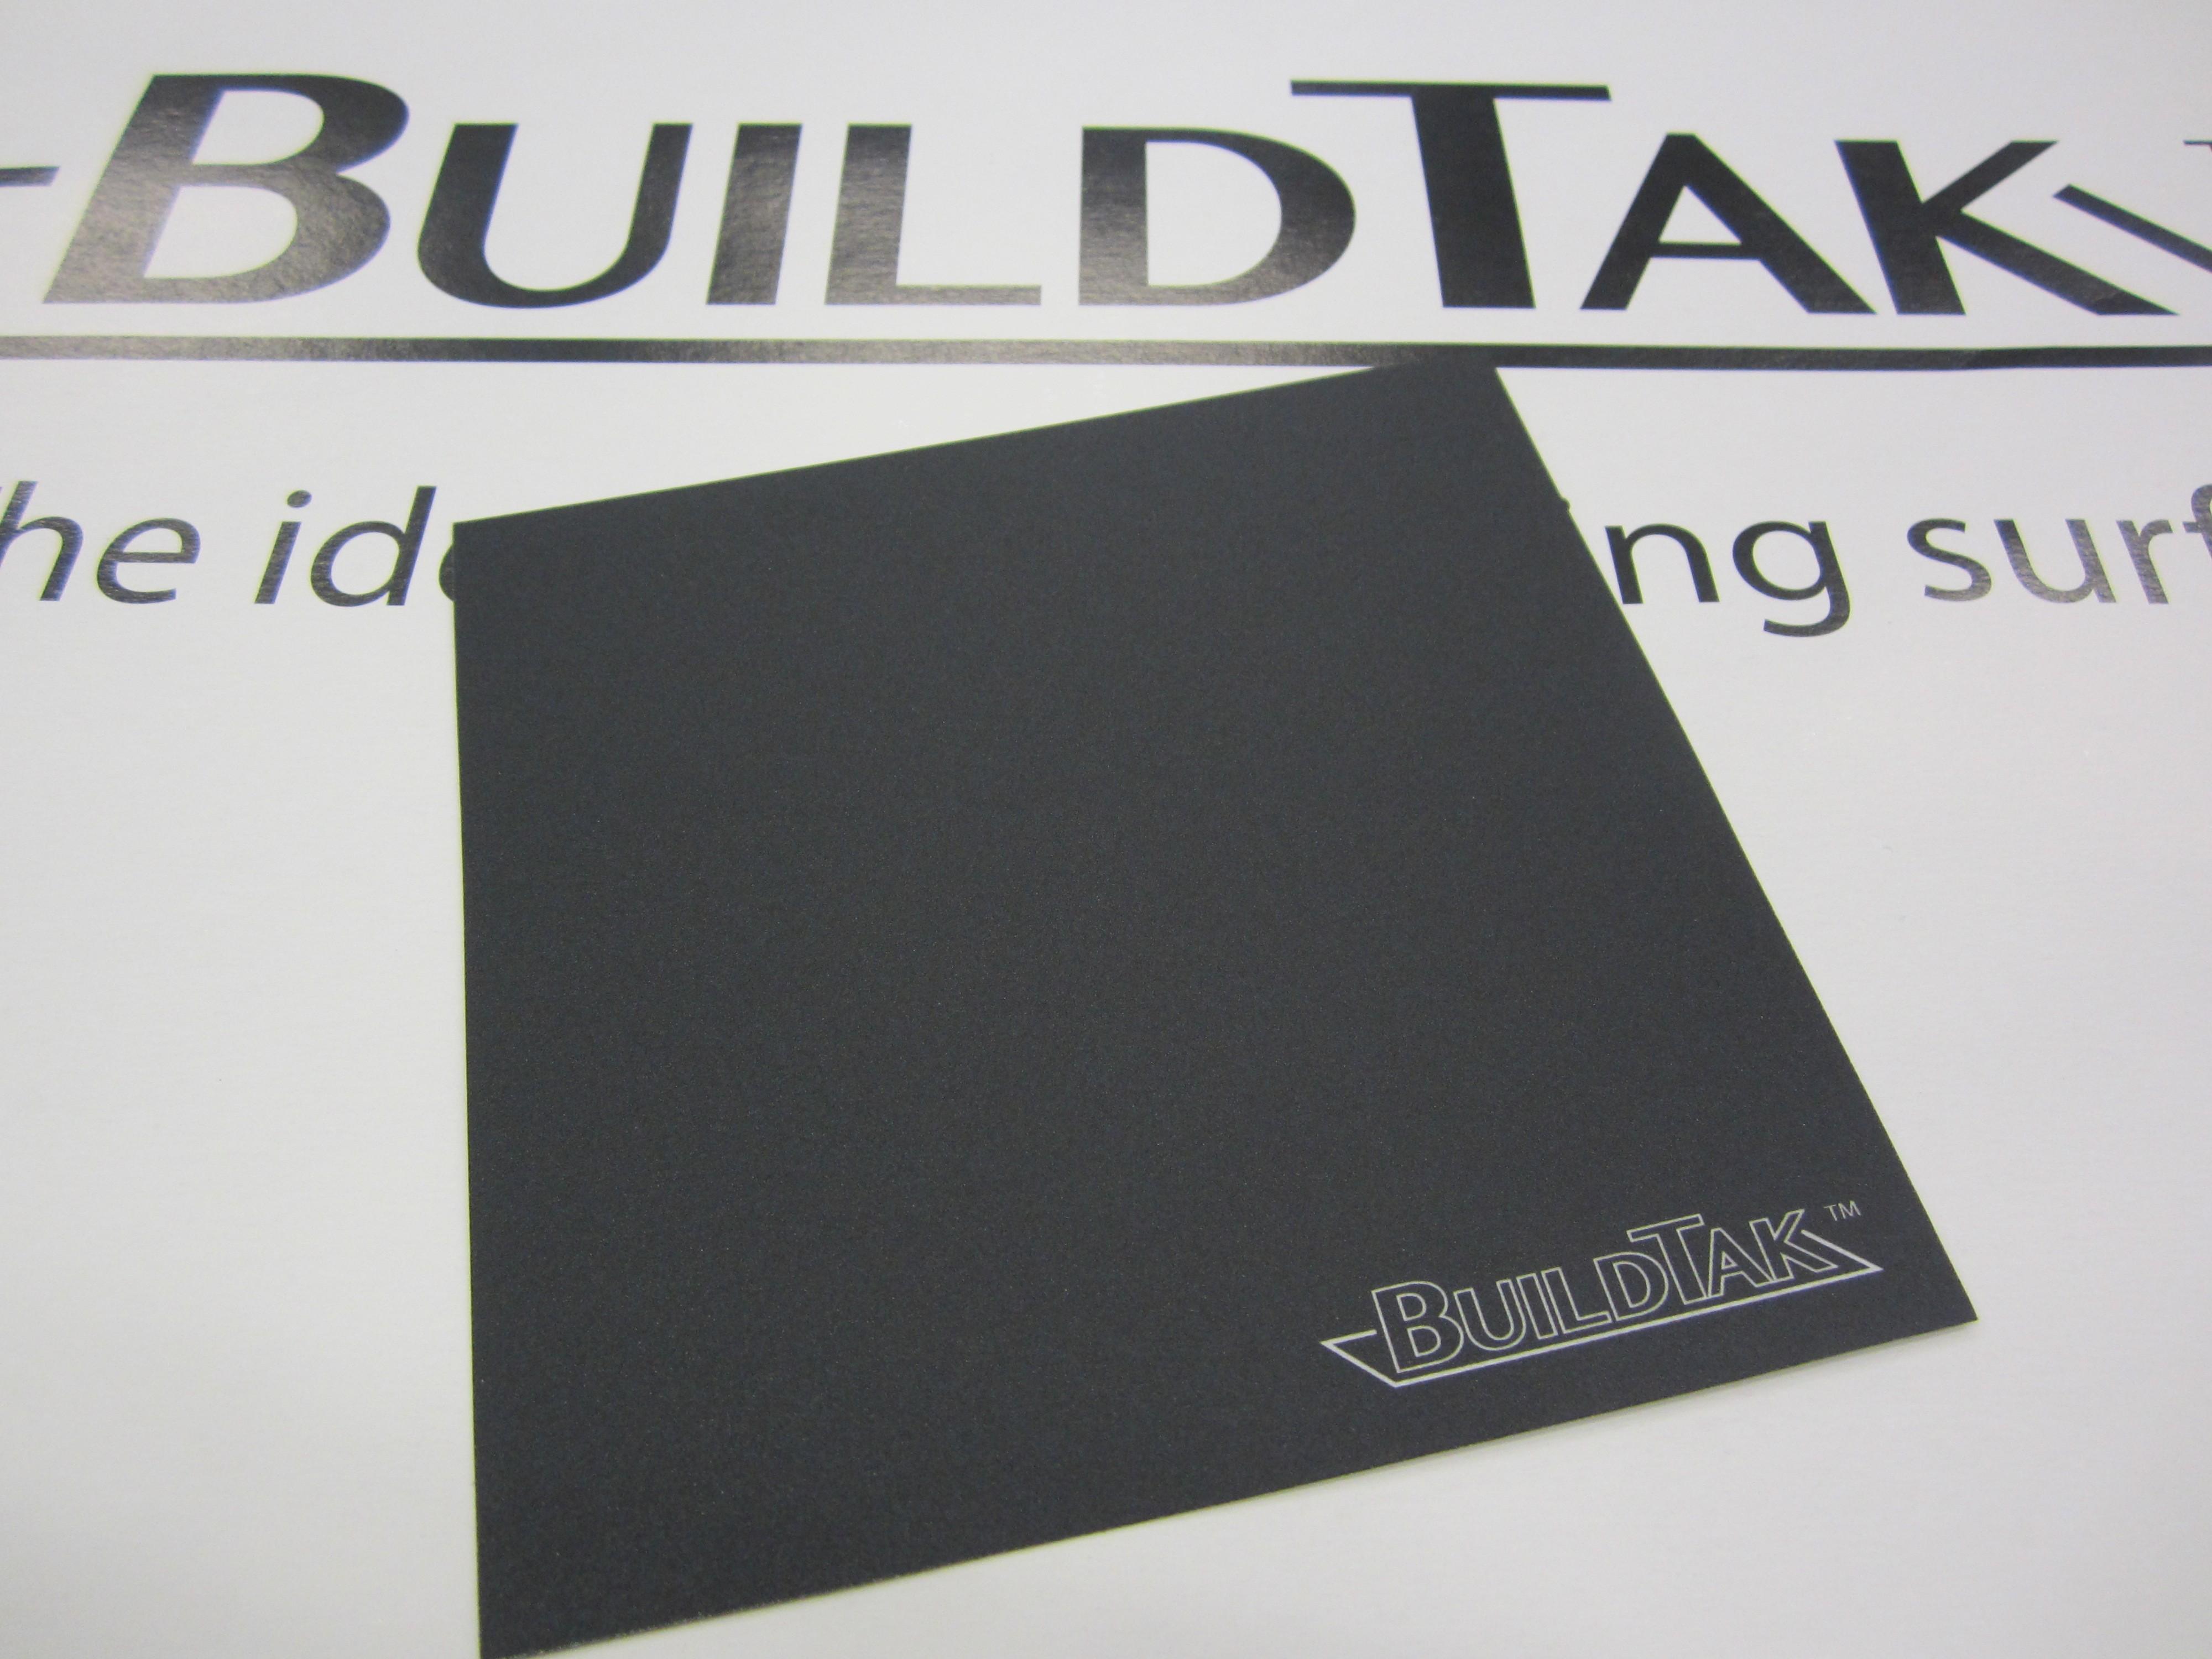 139x139 Buildtak